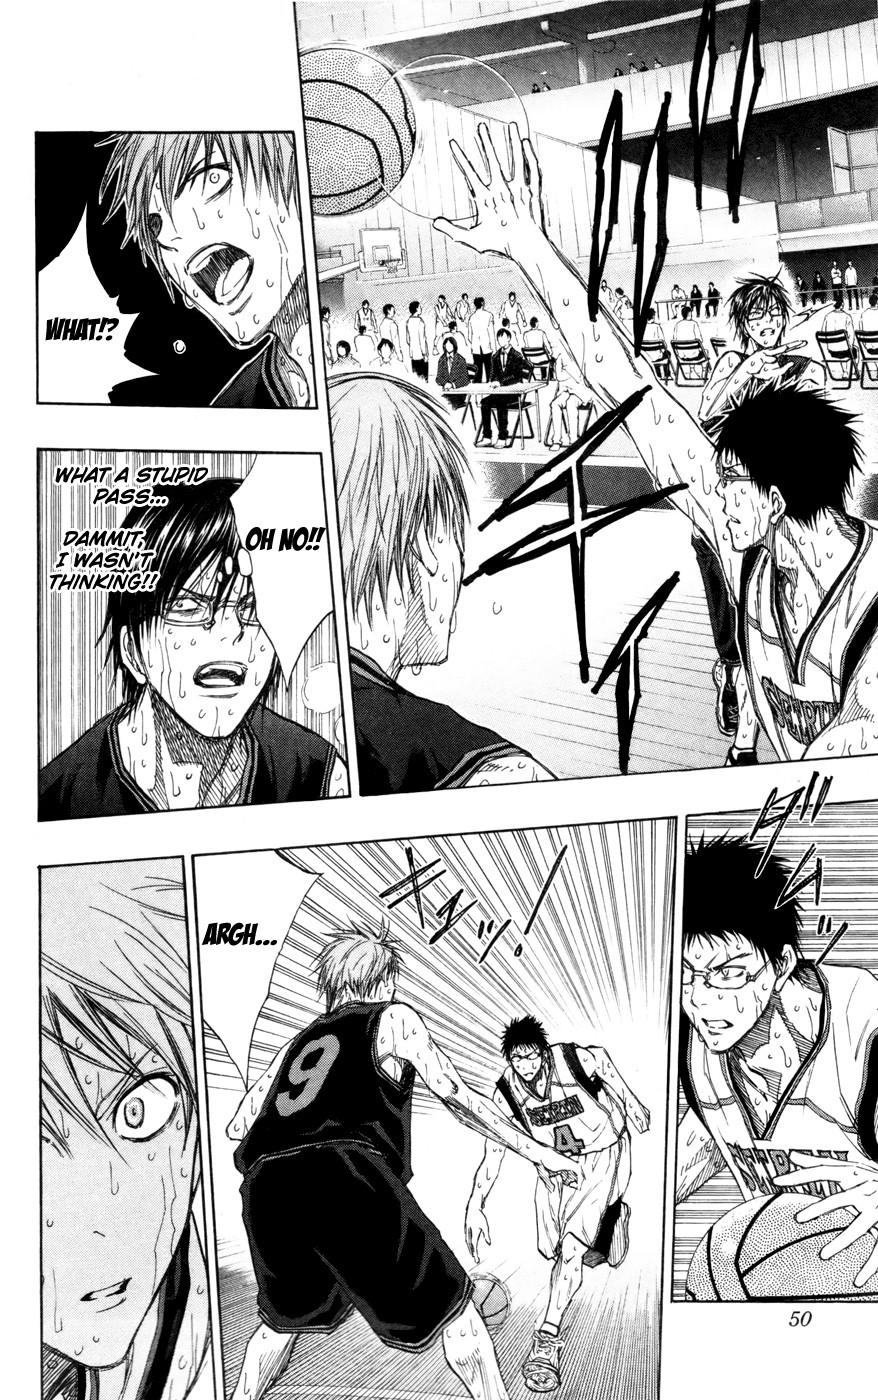 Kuroko no Basket Manga Chapter 129 - Image 03